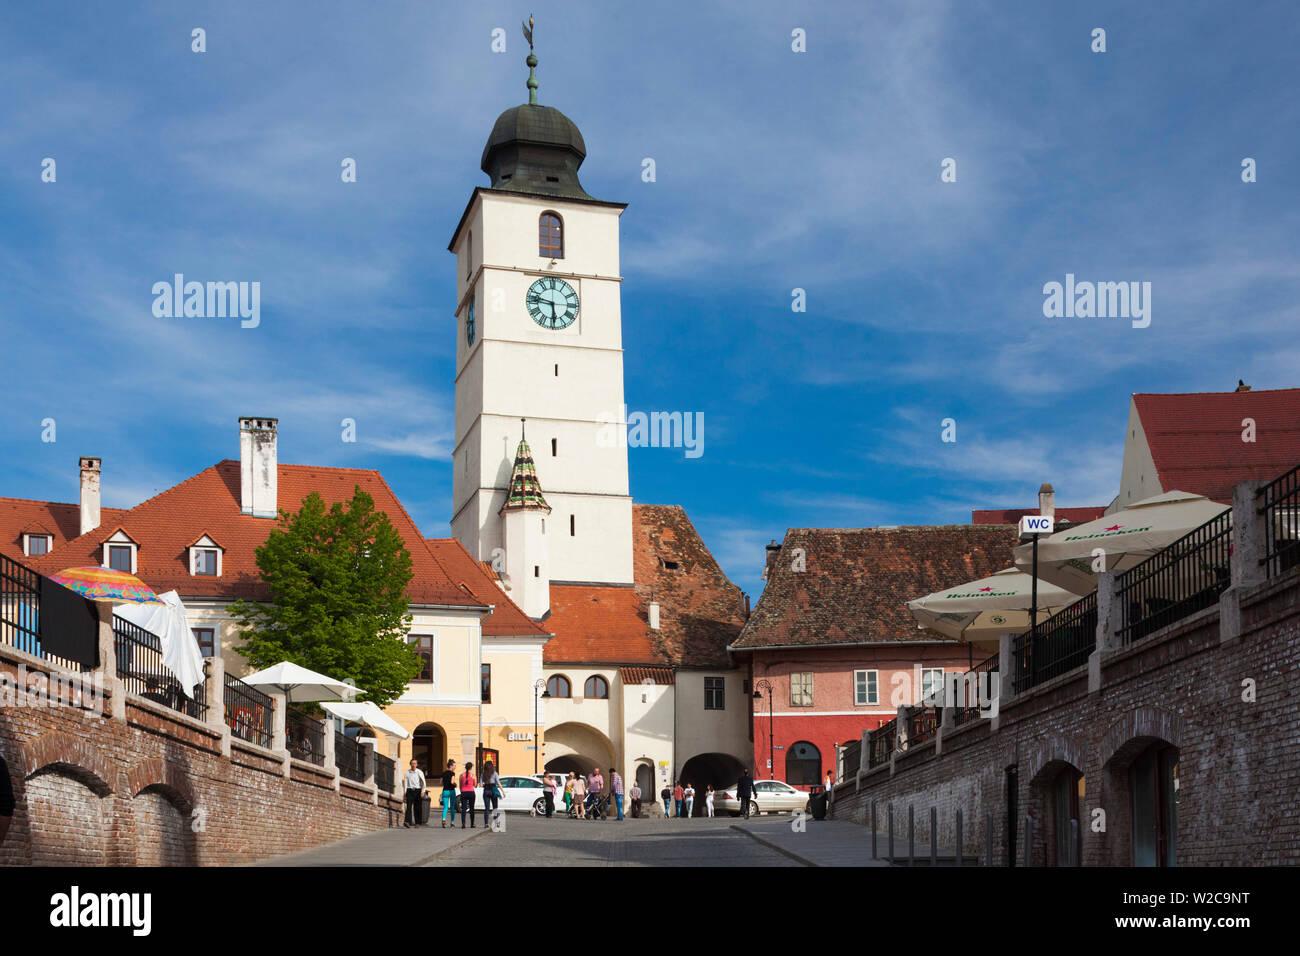 Romania, Transylvania, Sibiu, Piata Mica Square and Council Tower Stock Photo